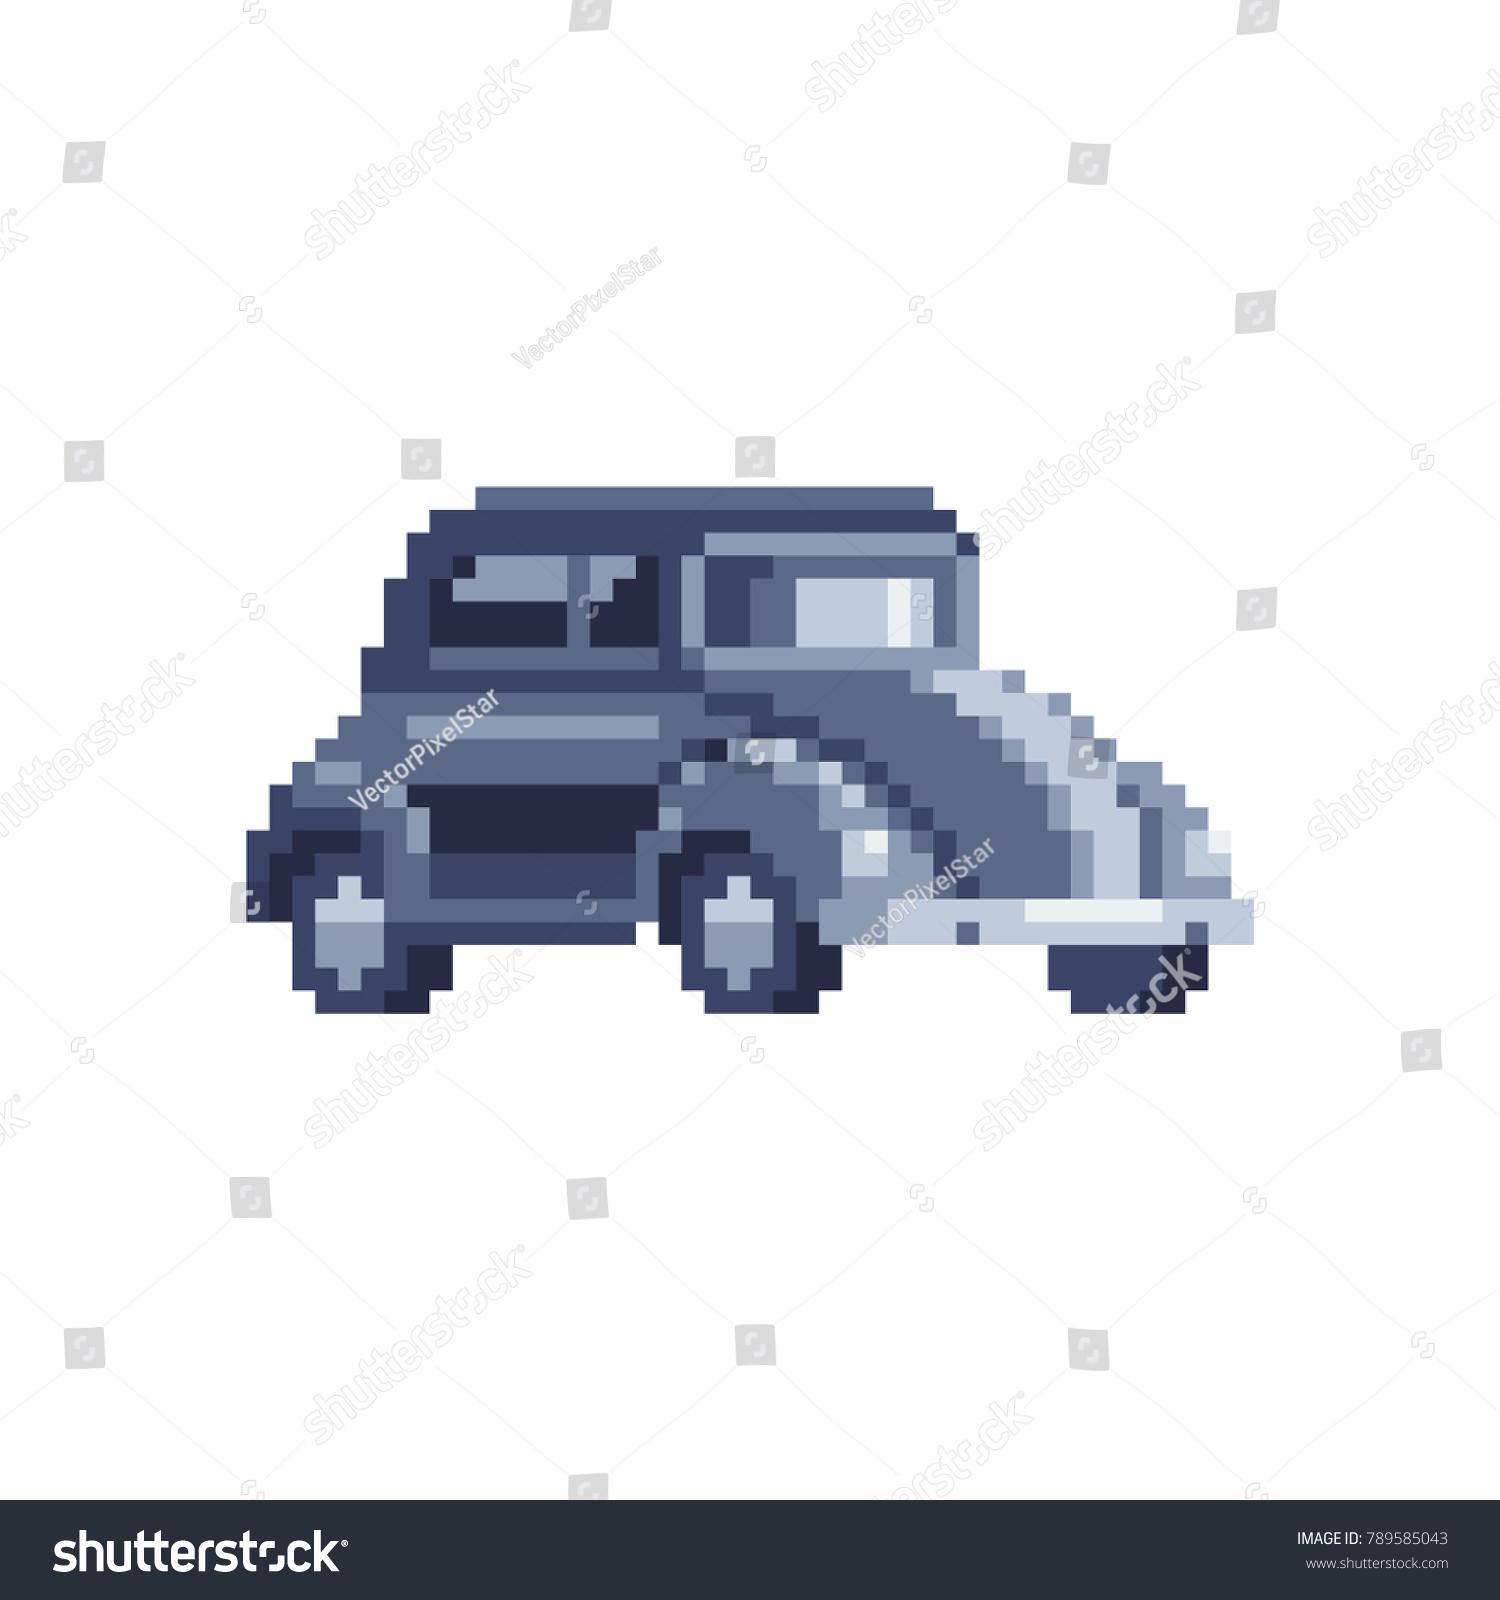 Retro Car Icon Pixel Art London Stock Vector Royalty Free